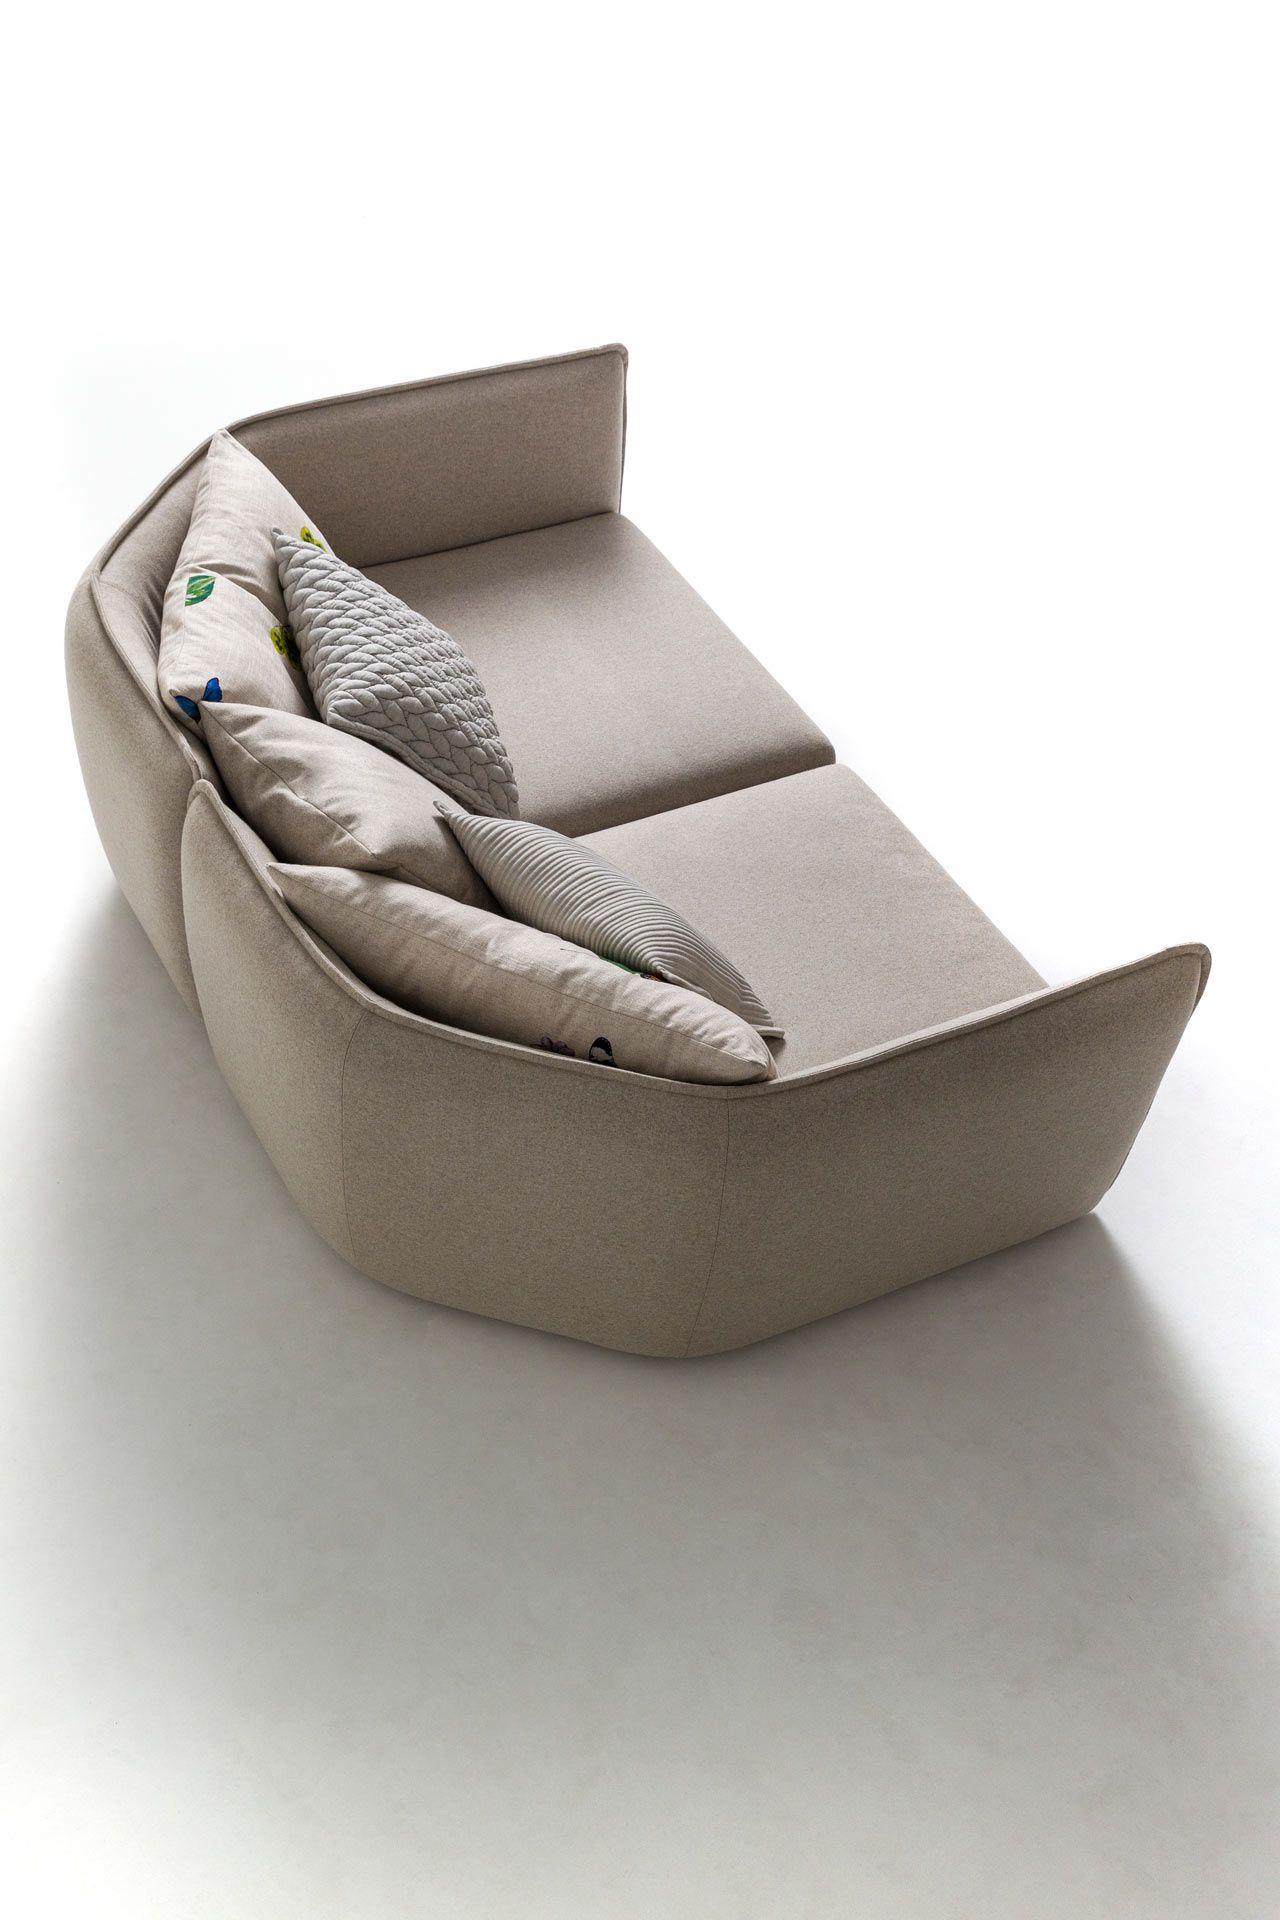 Incredible A Unique Sofa By Patricia Urquiola To Mark Her 20Th Interior Design Ideas Skatsoteloinfo